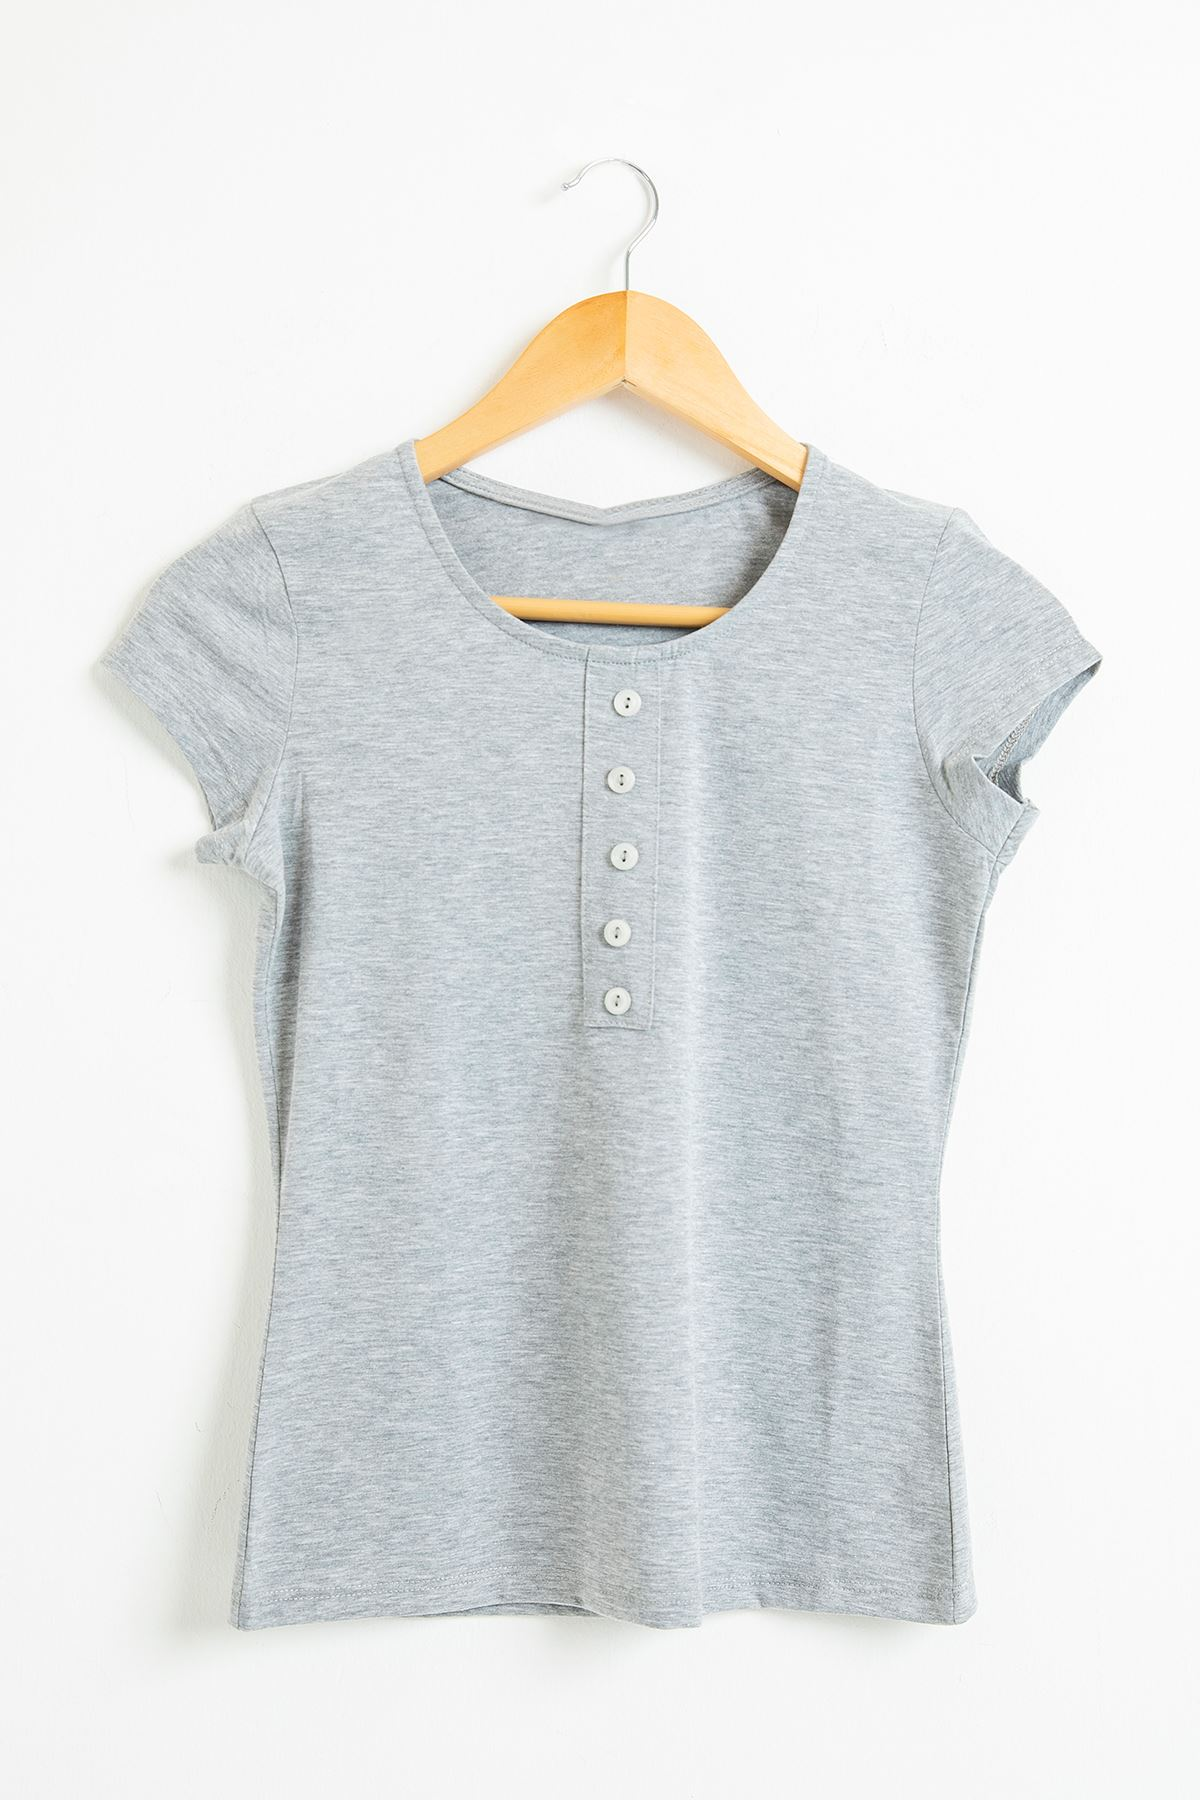 Önü Düğme Detaylı T-shirt-Gri